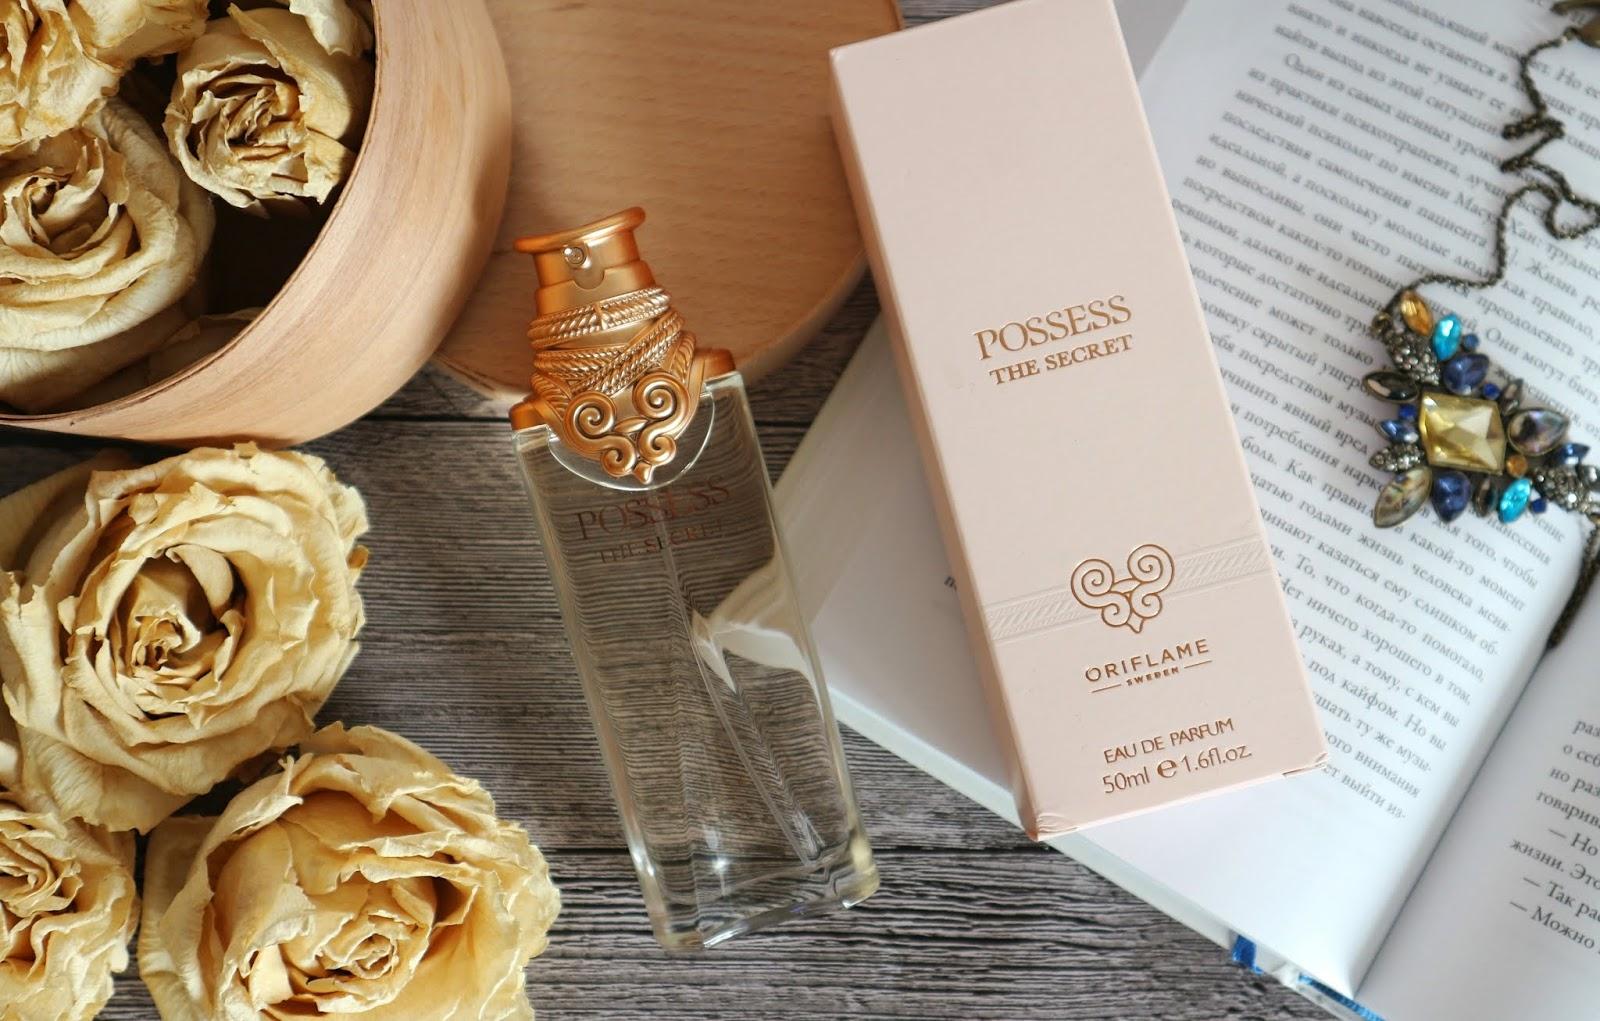 Possess The Secret парфюмерная вода